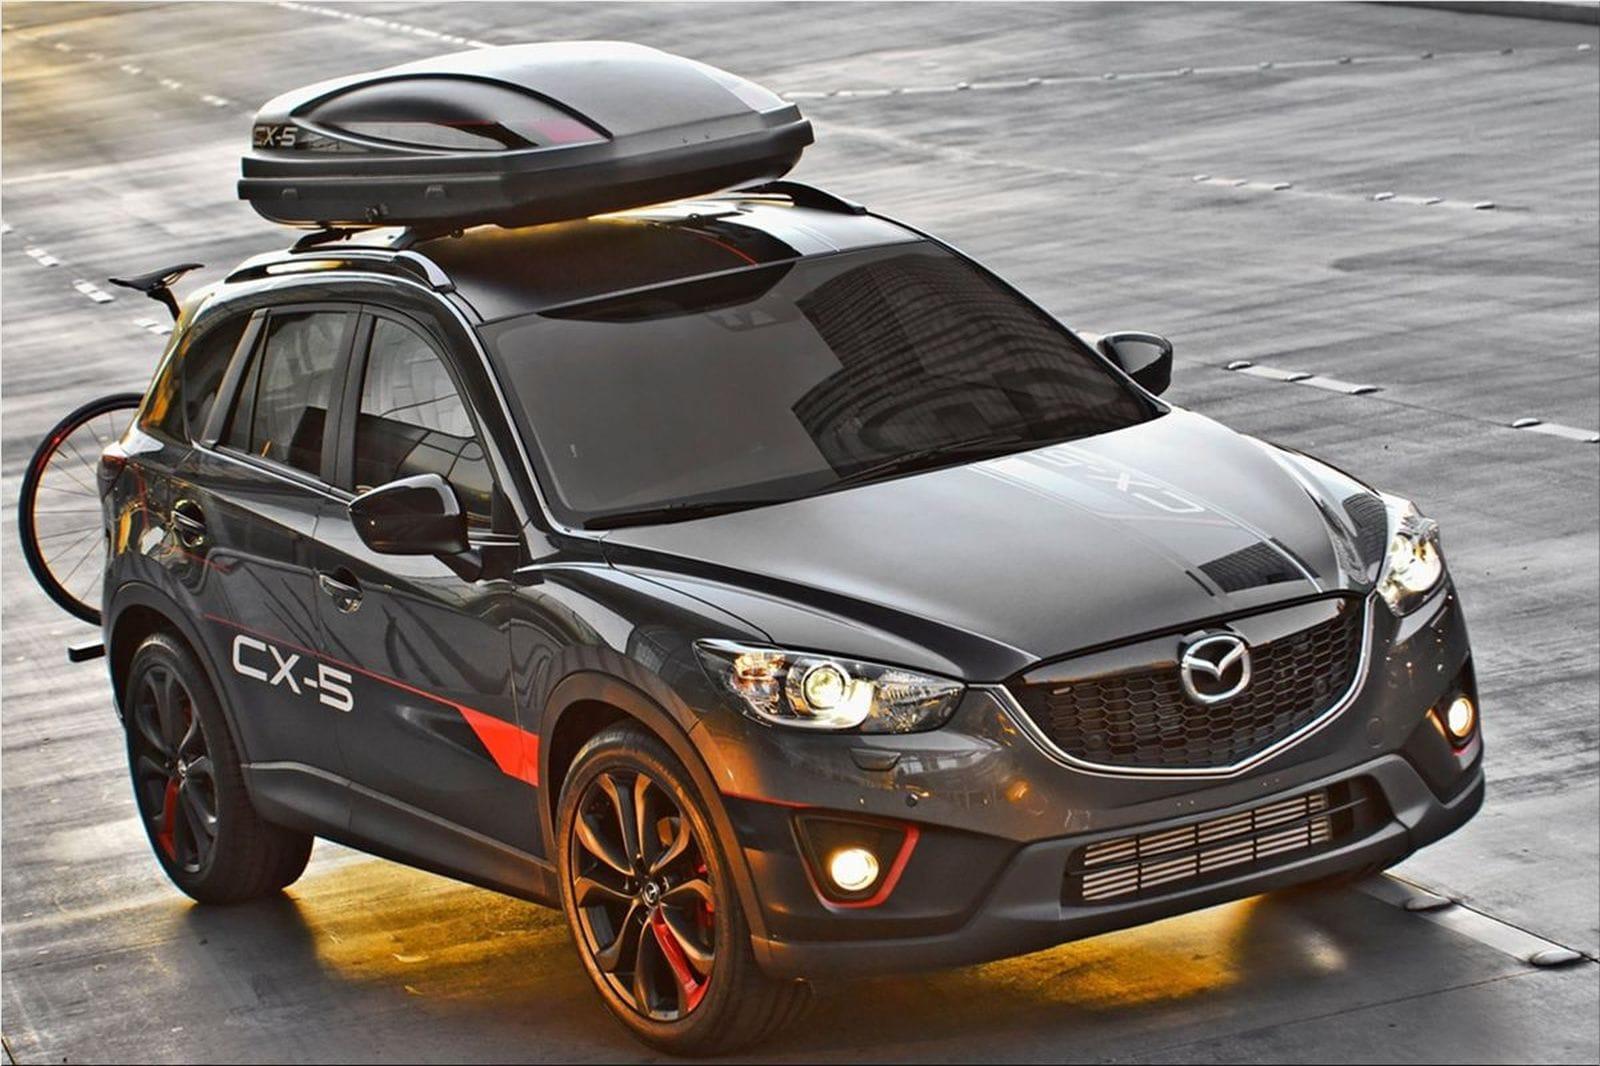 https://www.cardivision.com/files/image-gallery/Mazda-CX-5-Dempsey-Concept-s16450432.jpg